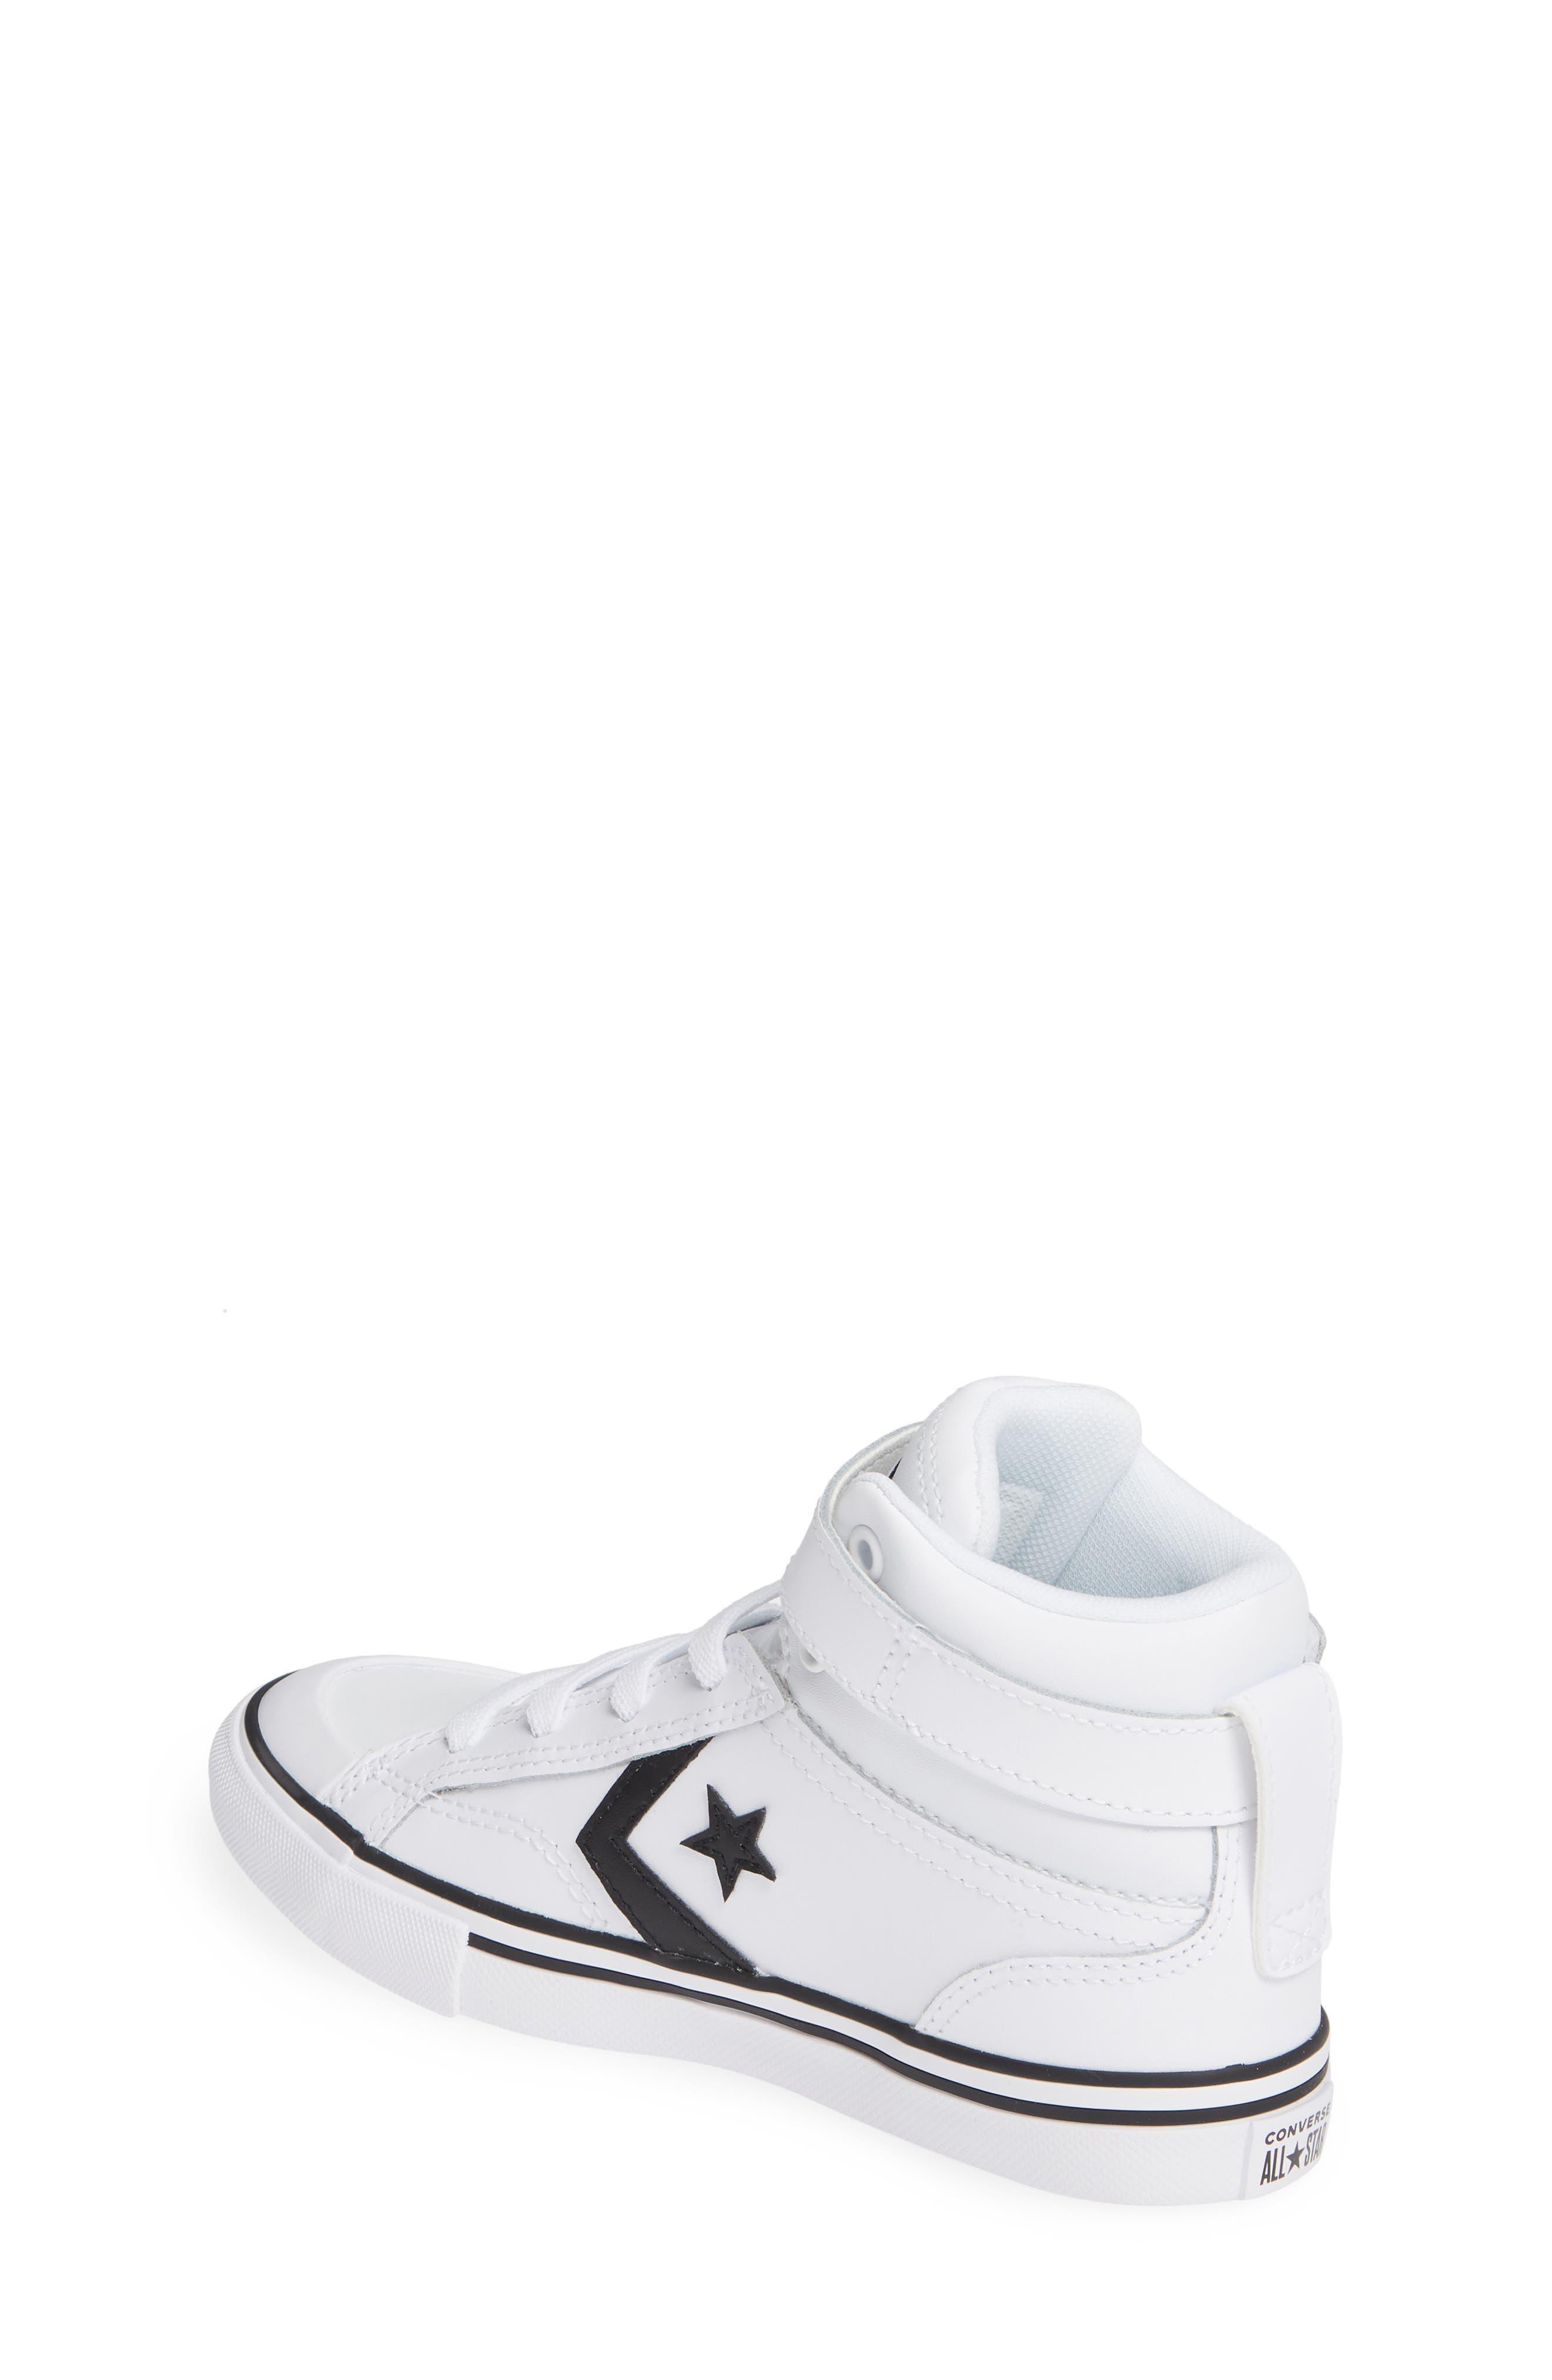 Pro Blaze High Top Sneaker,                             Alternate thumbnail 2, color,                             102